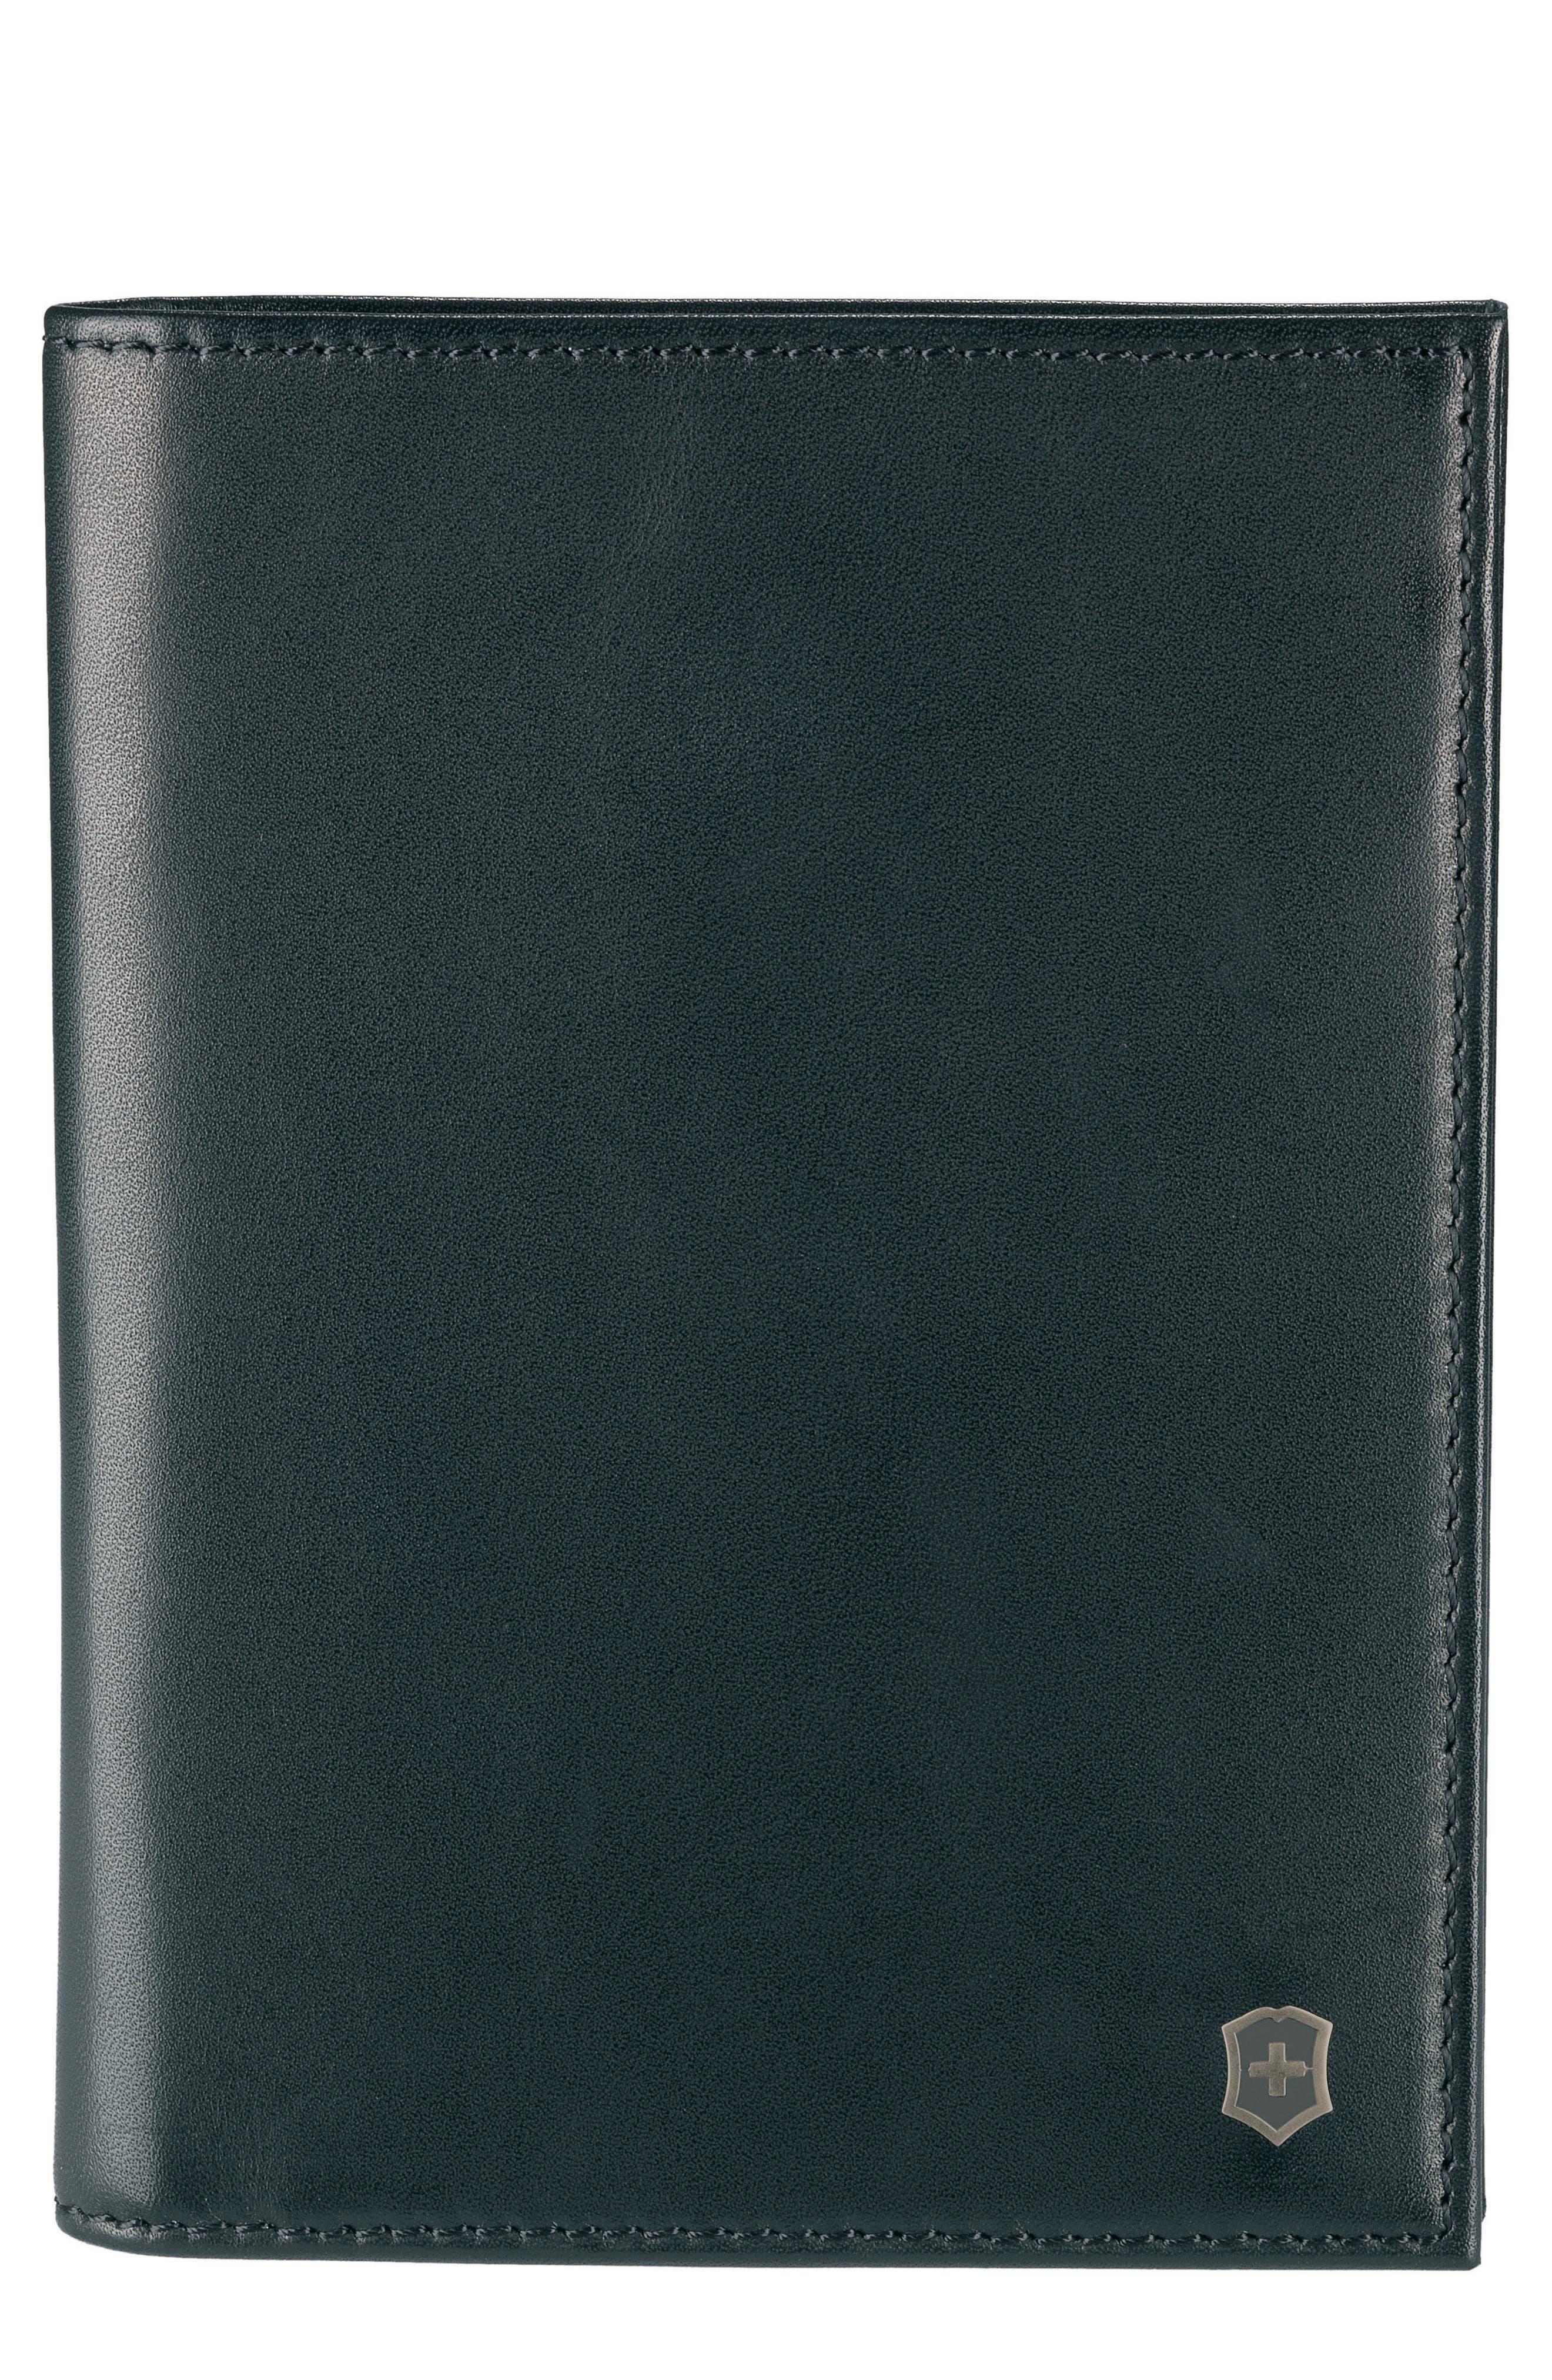 Altius Edge Leibnitz Travel Wallet,                             Main thumbnail 1, color,                             BLACK